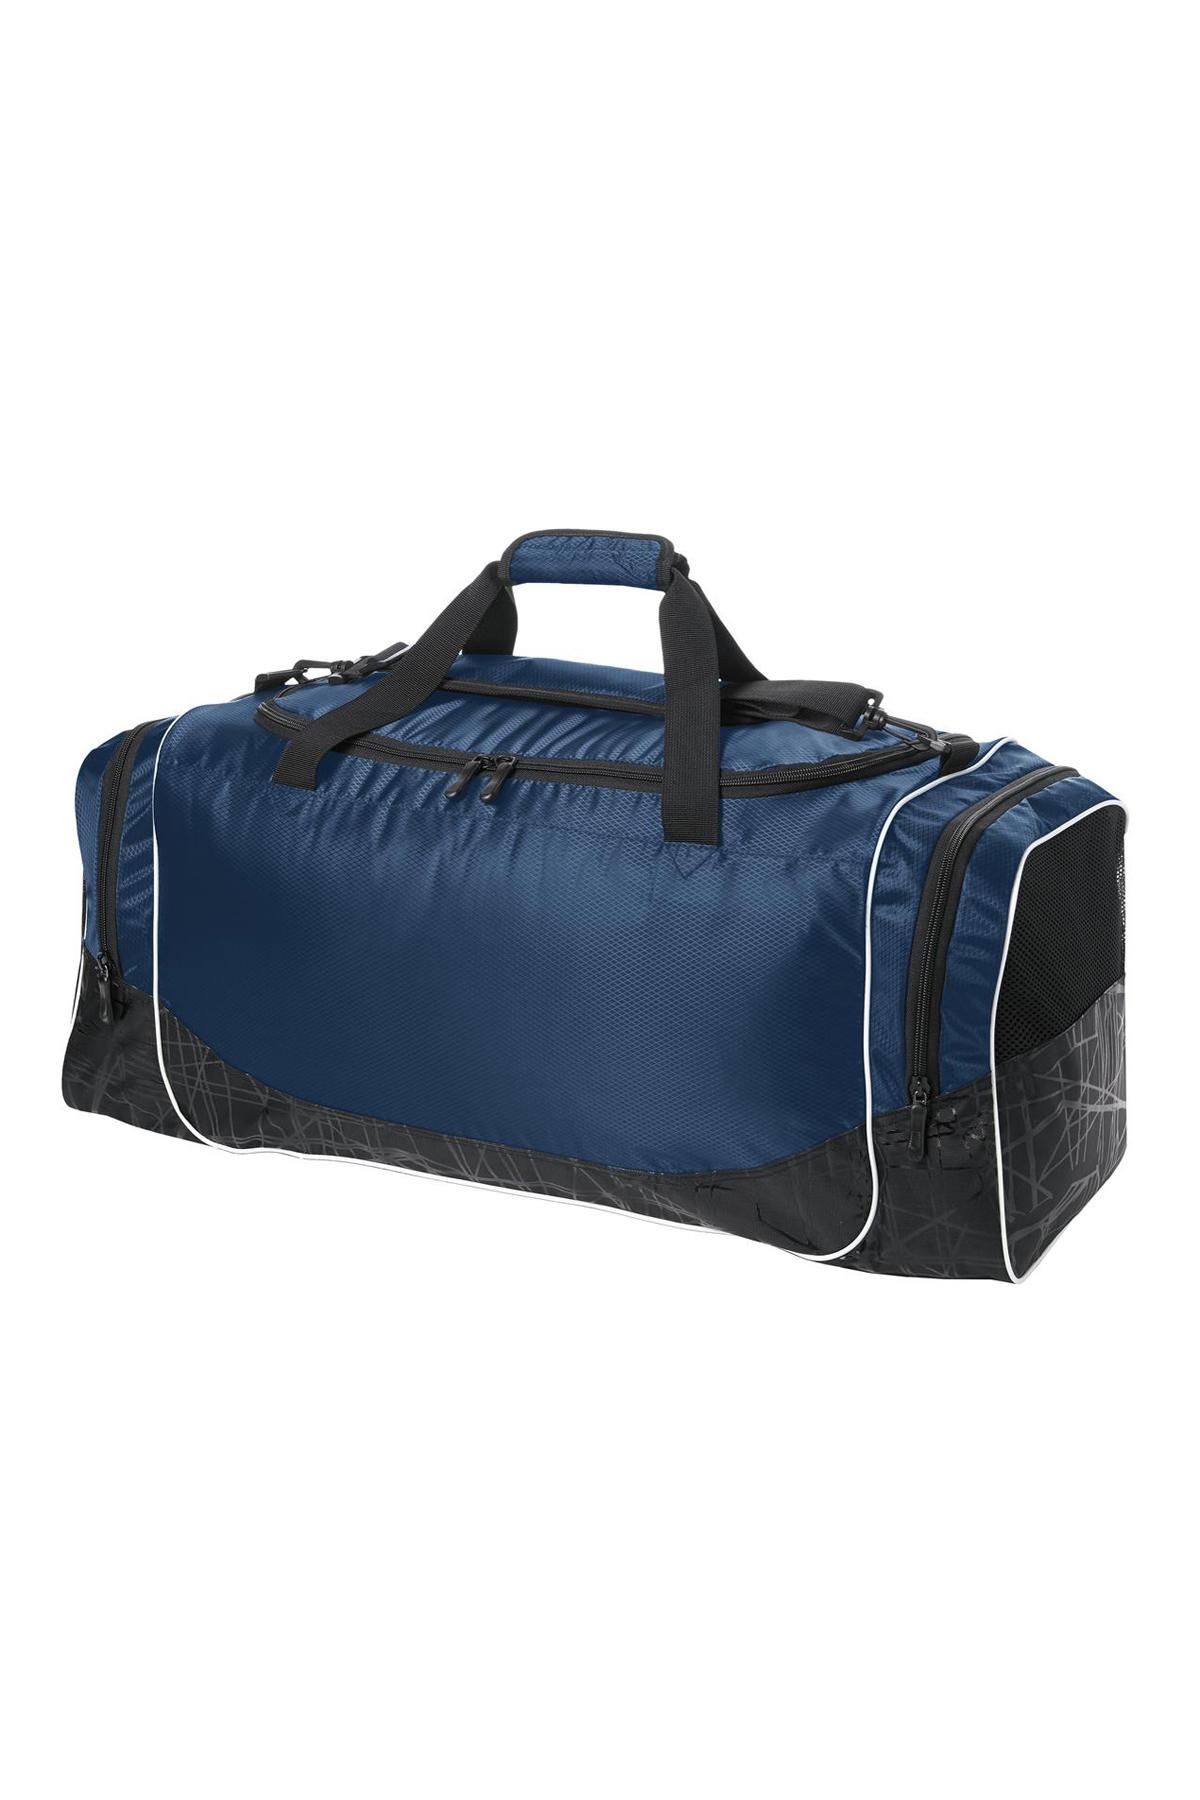 Bags-Duffels-20